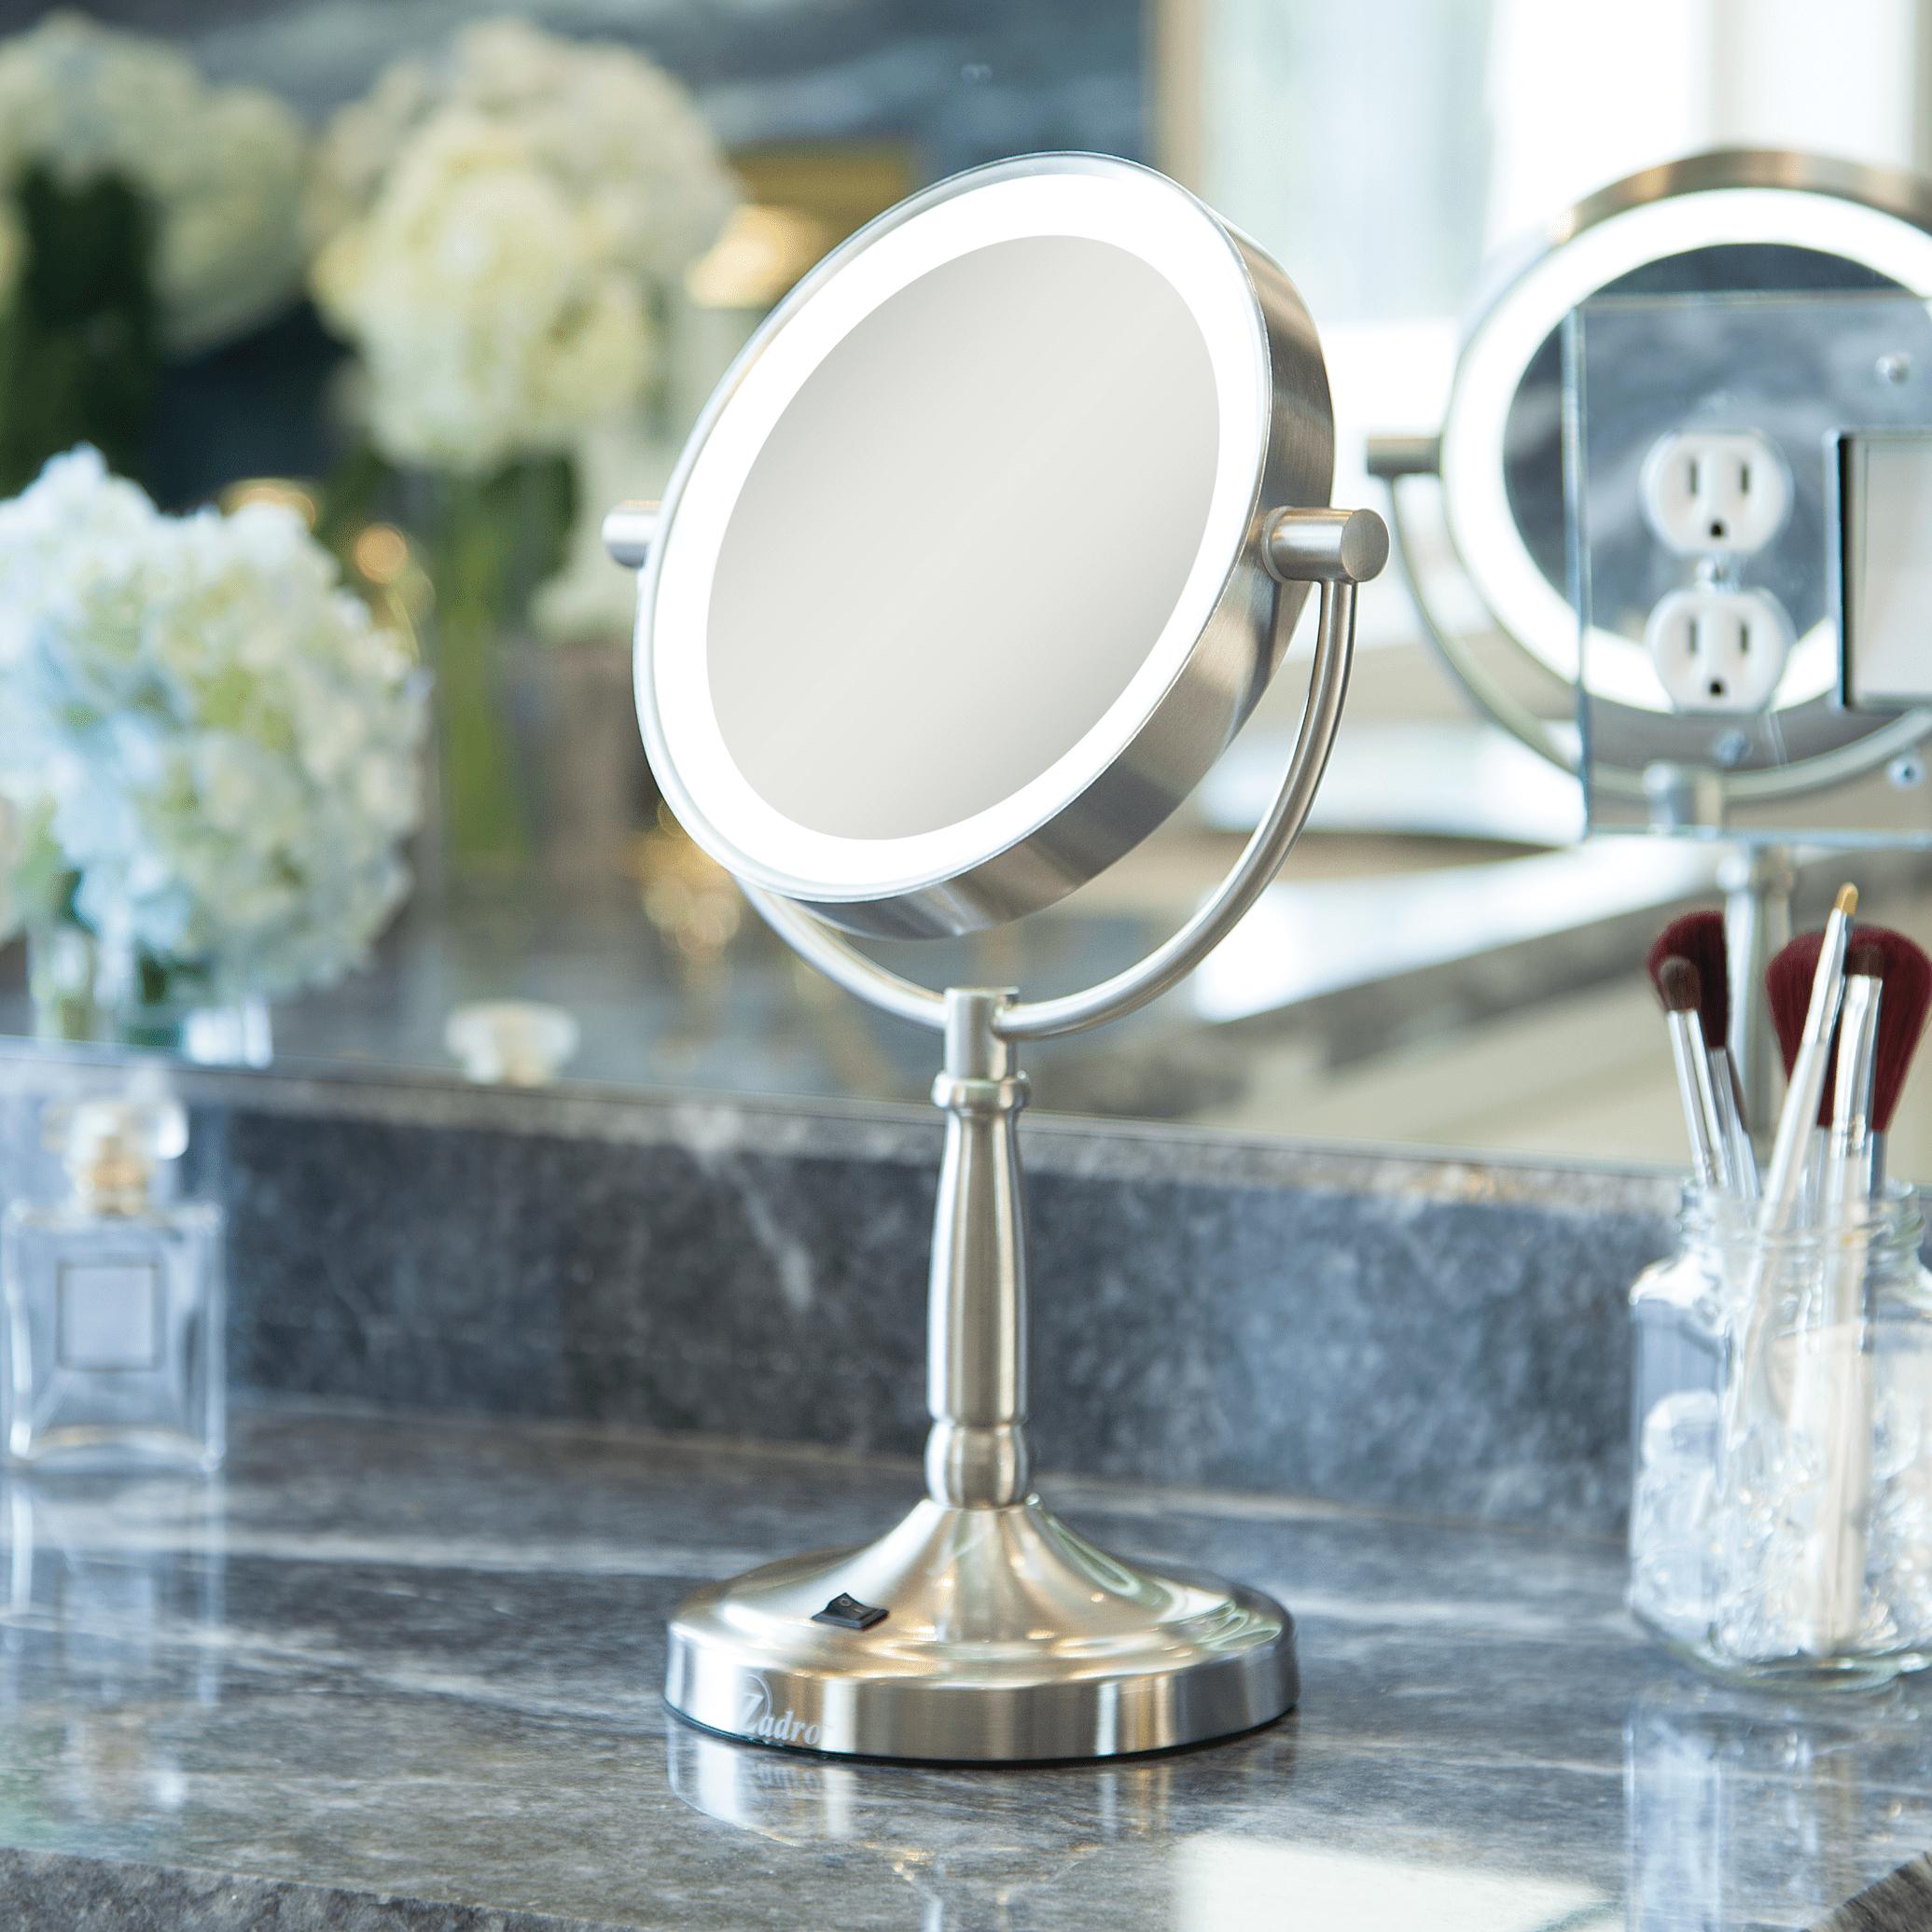 No 7 Makeup Mirror Light Bulb Mugeek Vidalondon